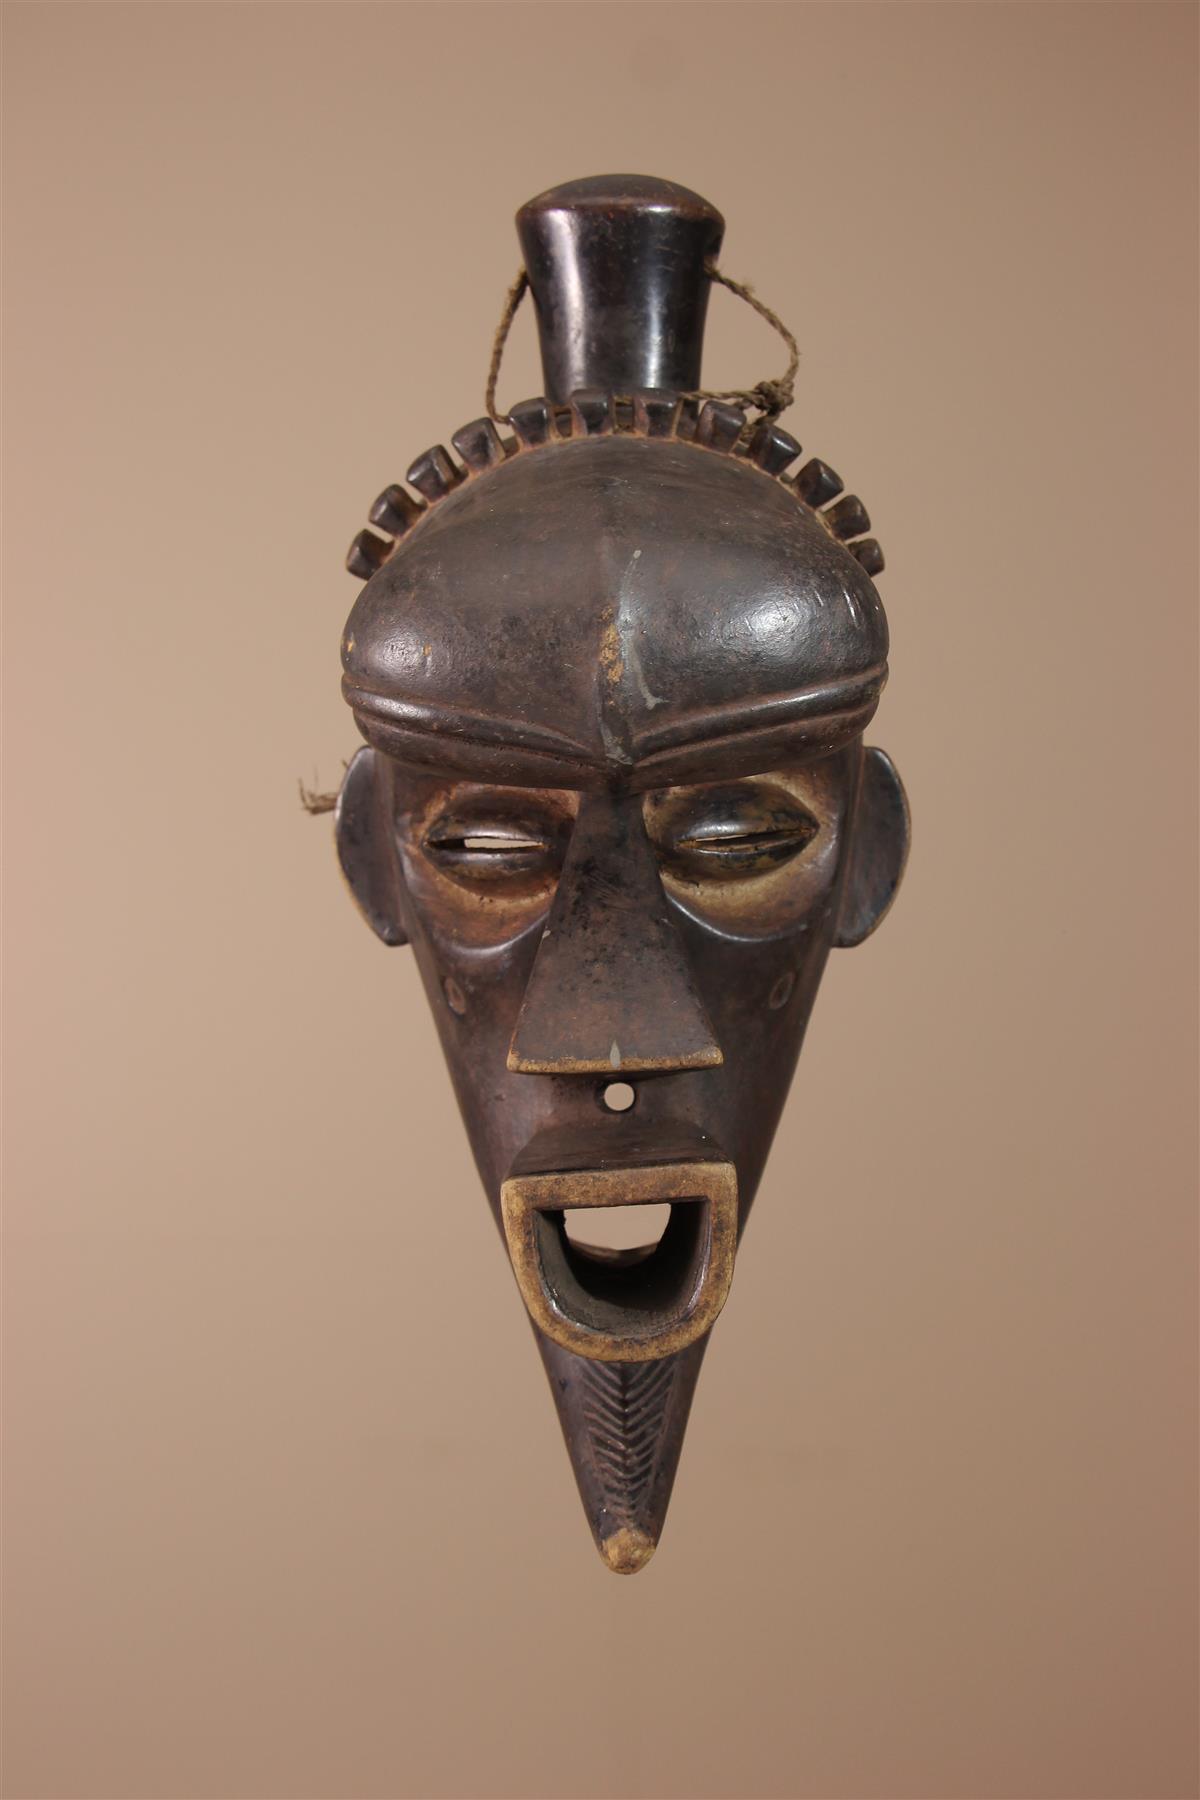 Masque Lulua - Déco africaine - Art africain traditionnel